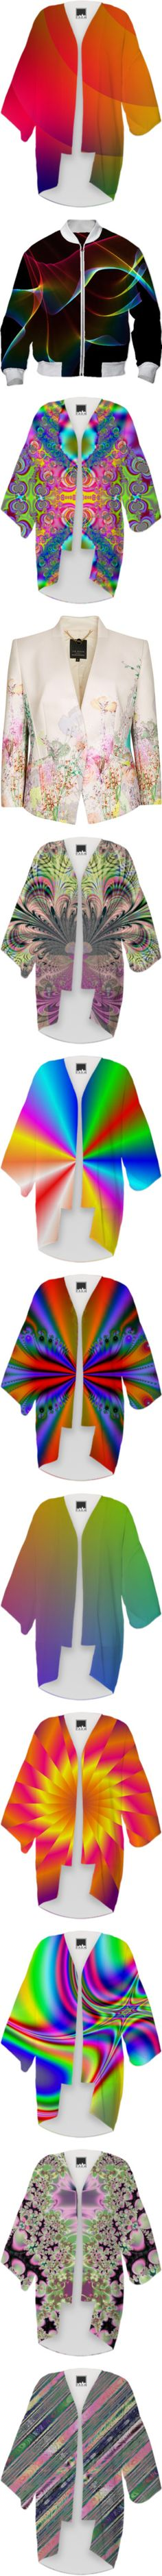 * #OUTERWEAR: #RAINBOW & #MULTICOLORED * by artist4god-rose-santuci-sofranko on Polyvore featuring polyvore, fashion, clothing, intimates, robes, kimono, kimono robe, accessories, outerwear, jackets, light pink, floral jacket, collarless jacket, light pink jacket, ted baker, ted baker jacket, purple kimono, purple robe, sash belt, striped, satin kimono robe, satin kimono, satin robe, boho kimono, parties, beach kimono, beach robe, flowers, flower kimono, flower robe, pink kimono robe, yellow…